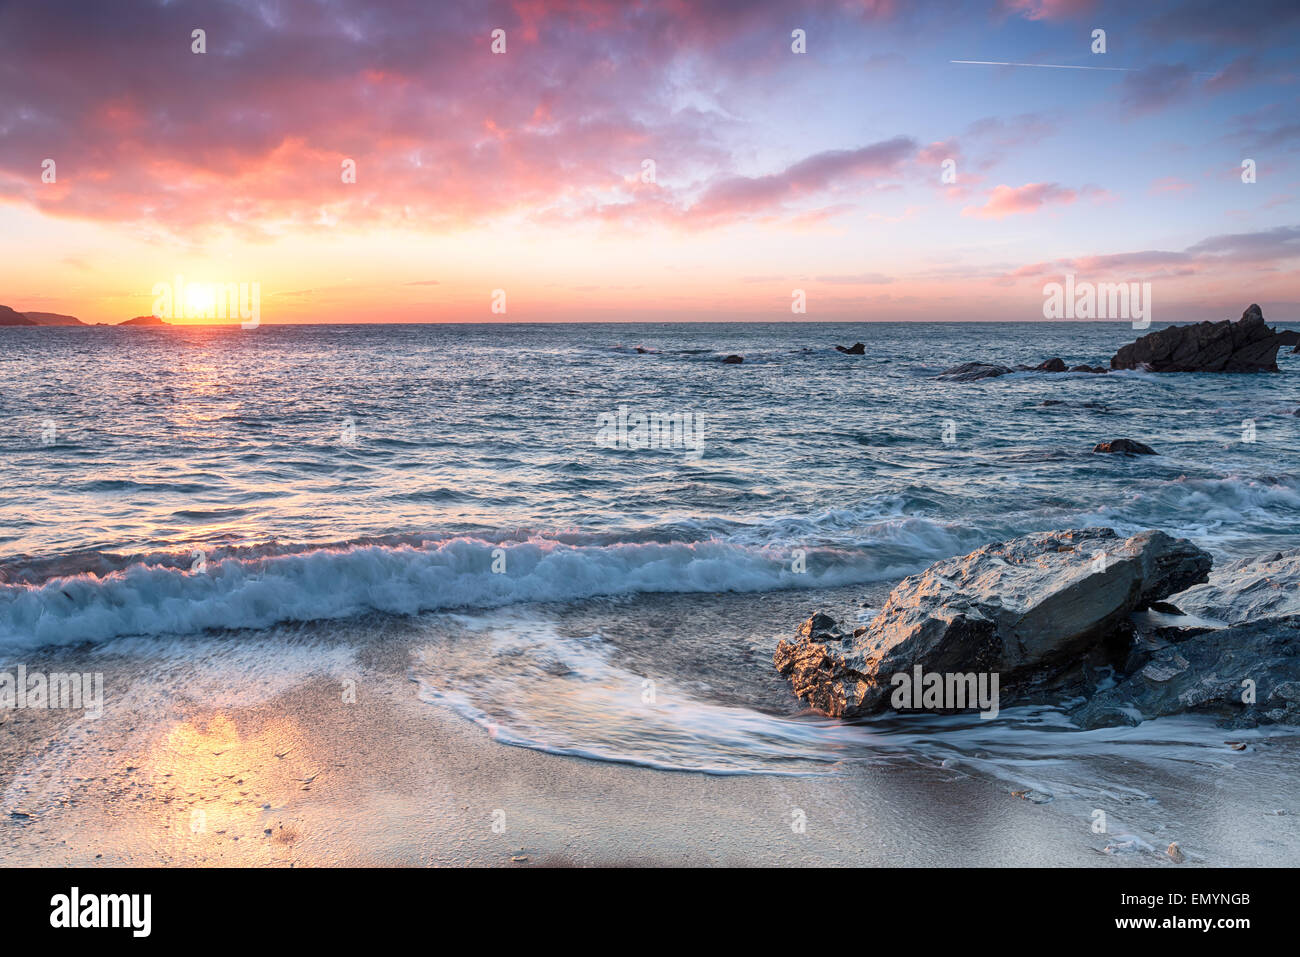 Schöner Strand bei Sonnenuntergang Stockbild